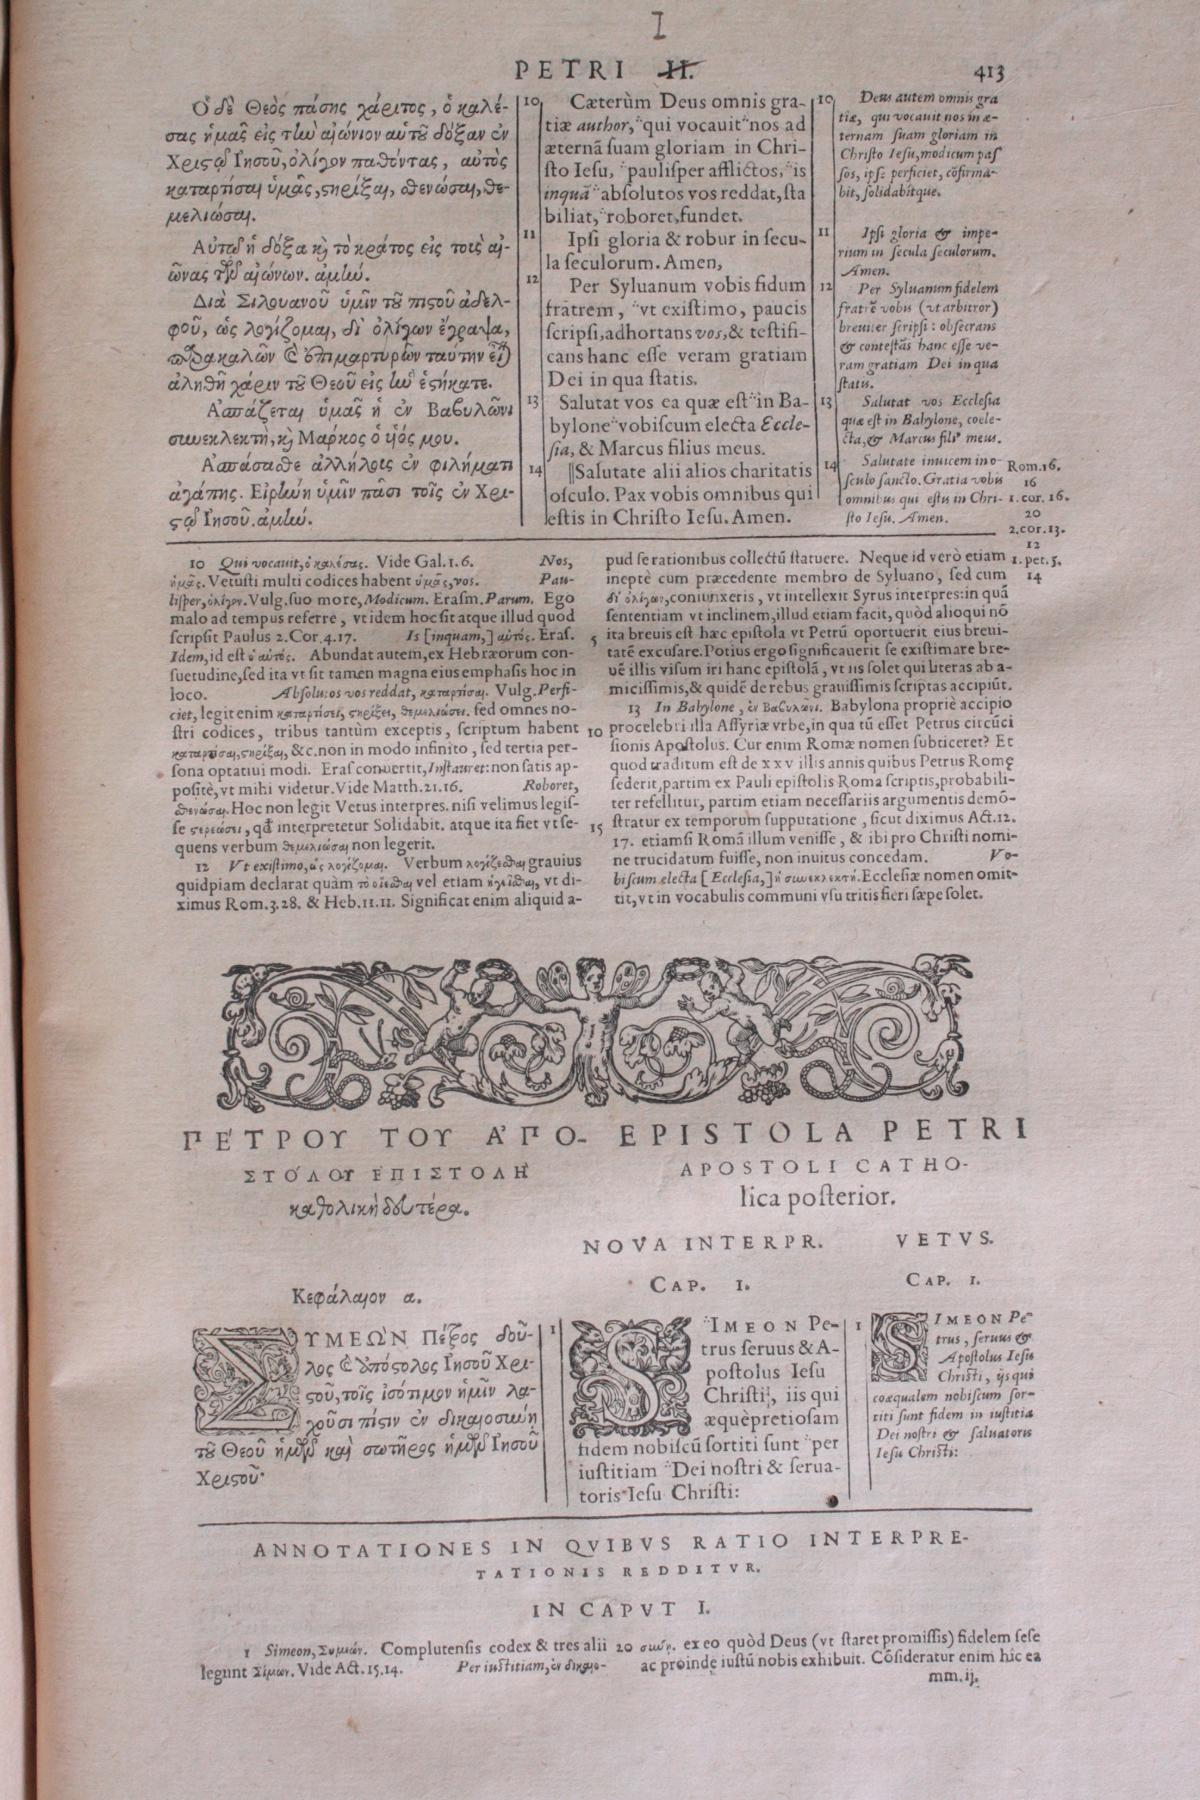 Griechische-Lateinische Bibel, Novum Testamentum 1582-17